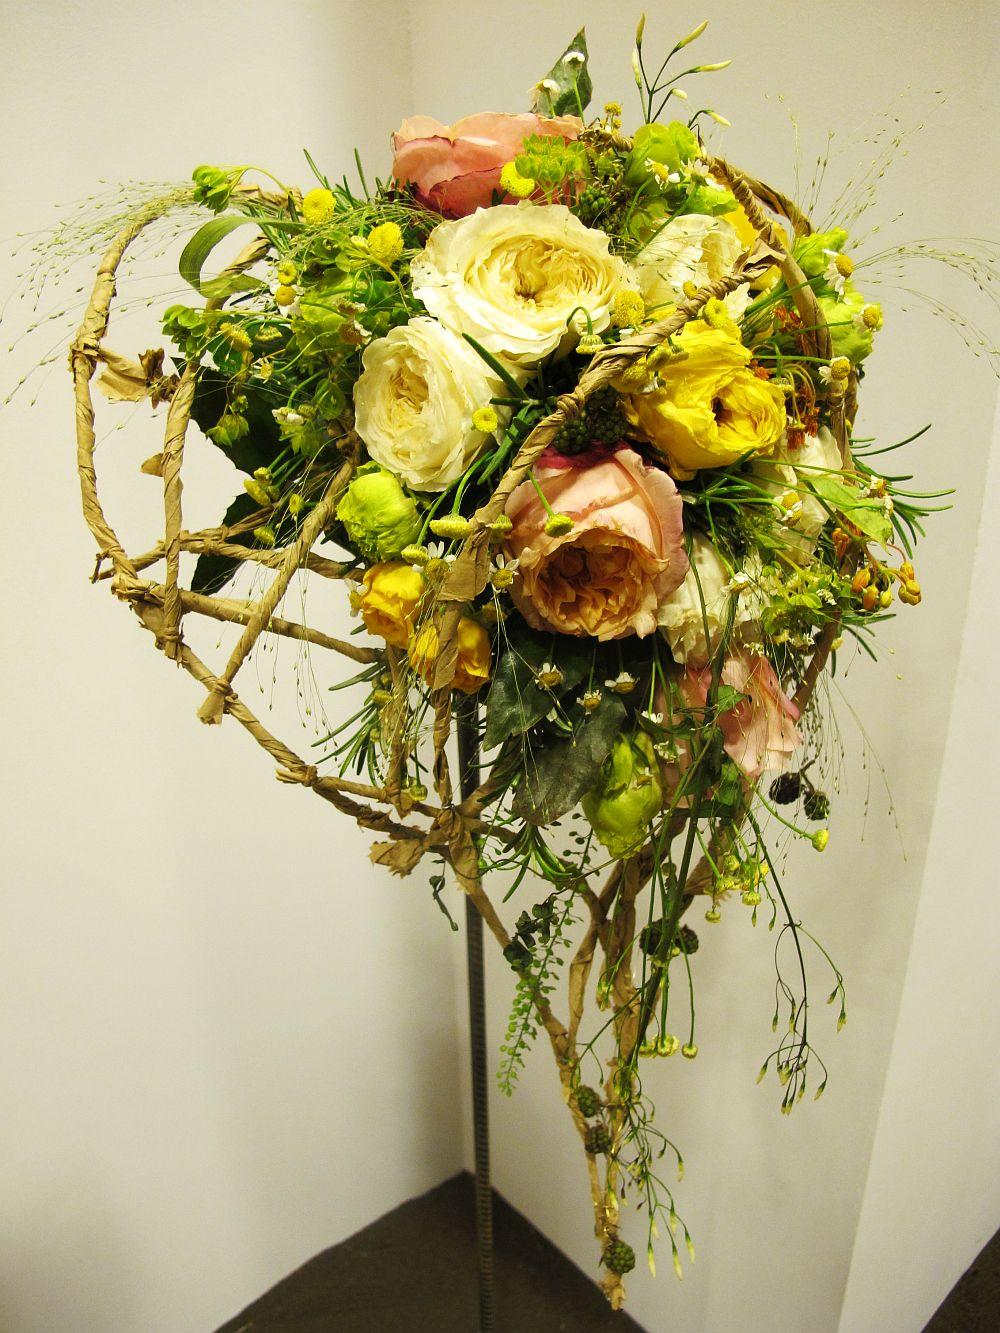 adelaparvu.com about Romanian wedding theme, Floraria Iris stand, floral designer Nicu Bocancea (16)